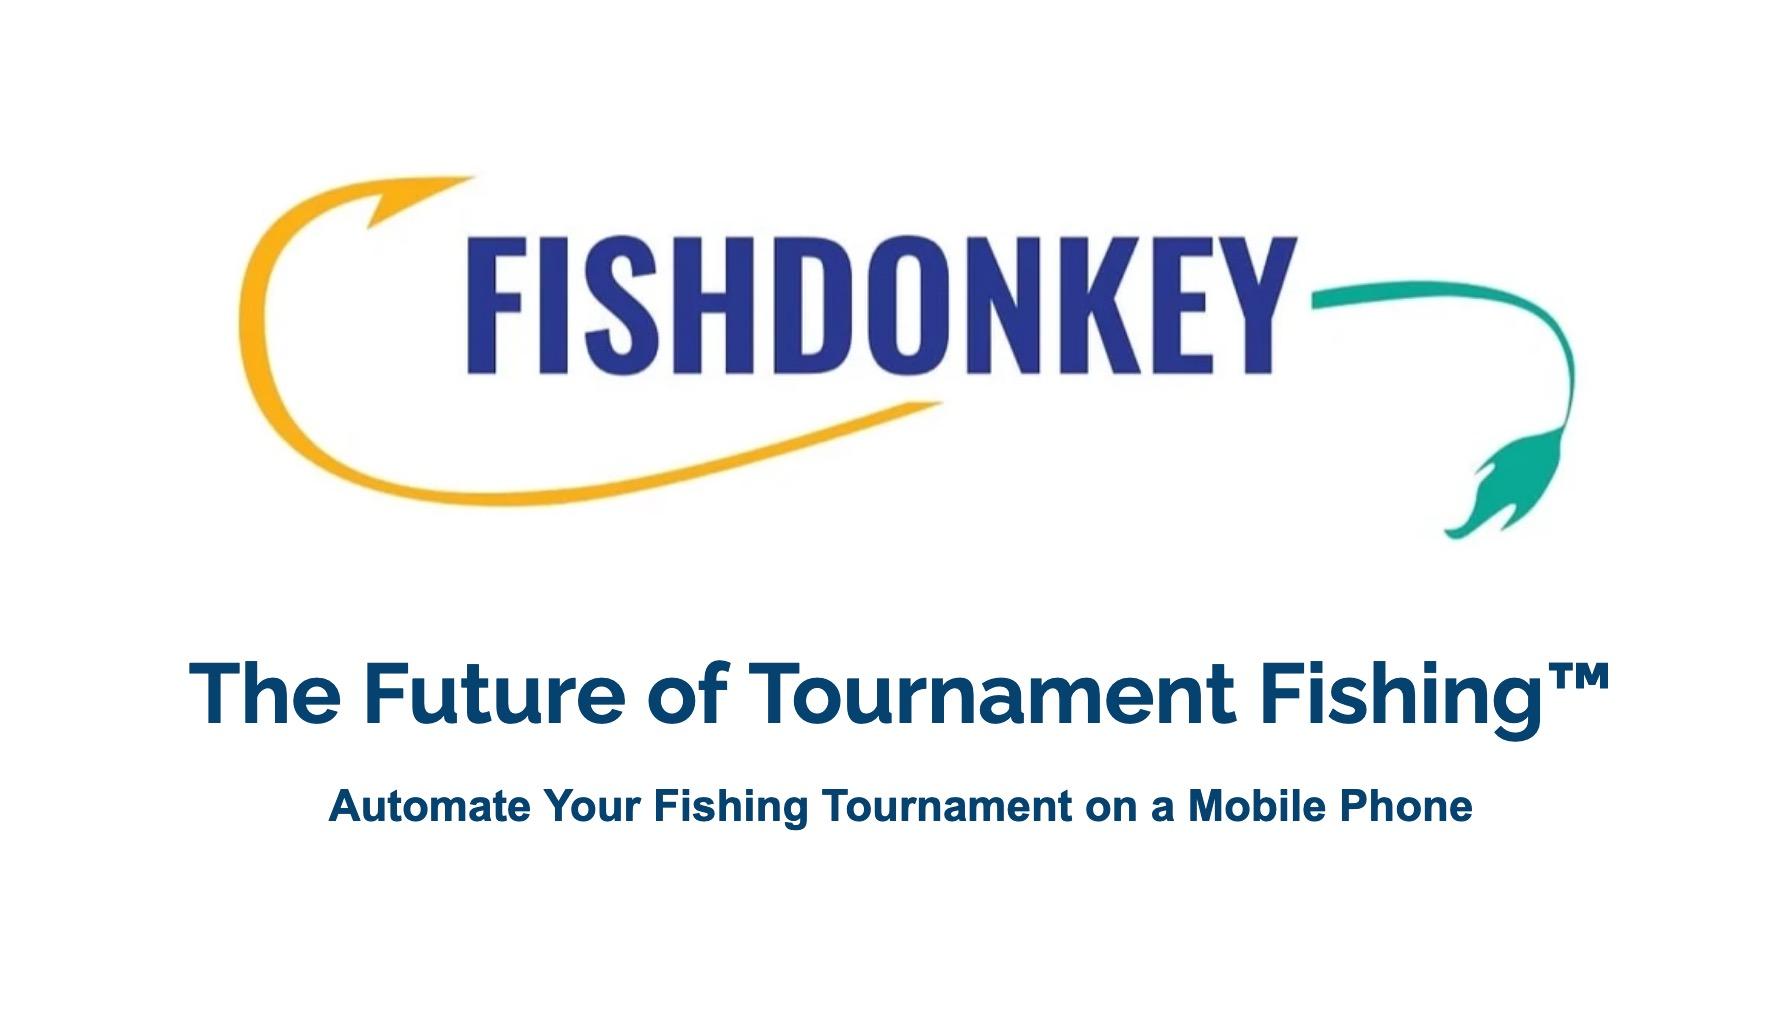 Fish Donkey Logo